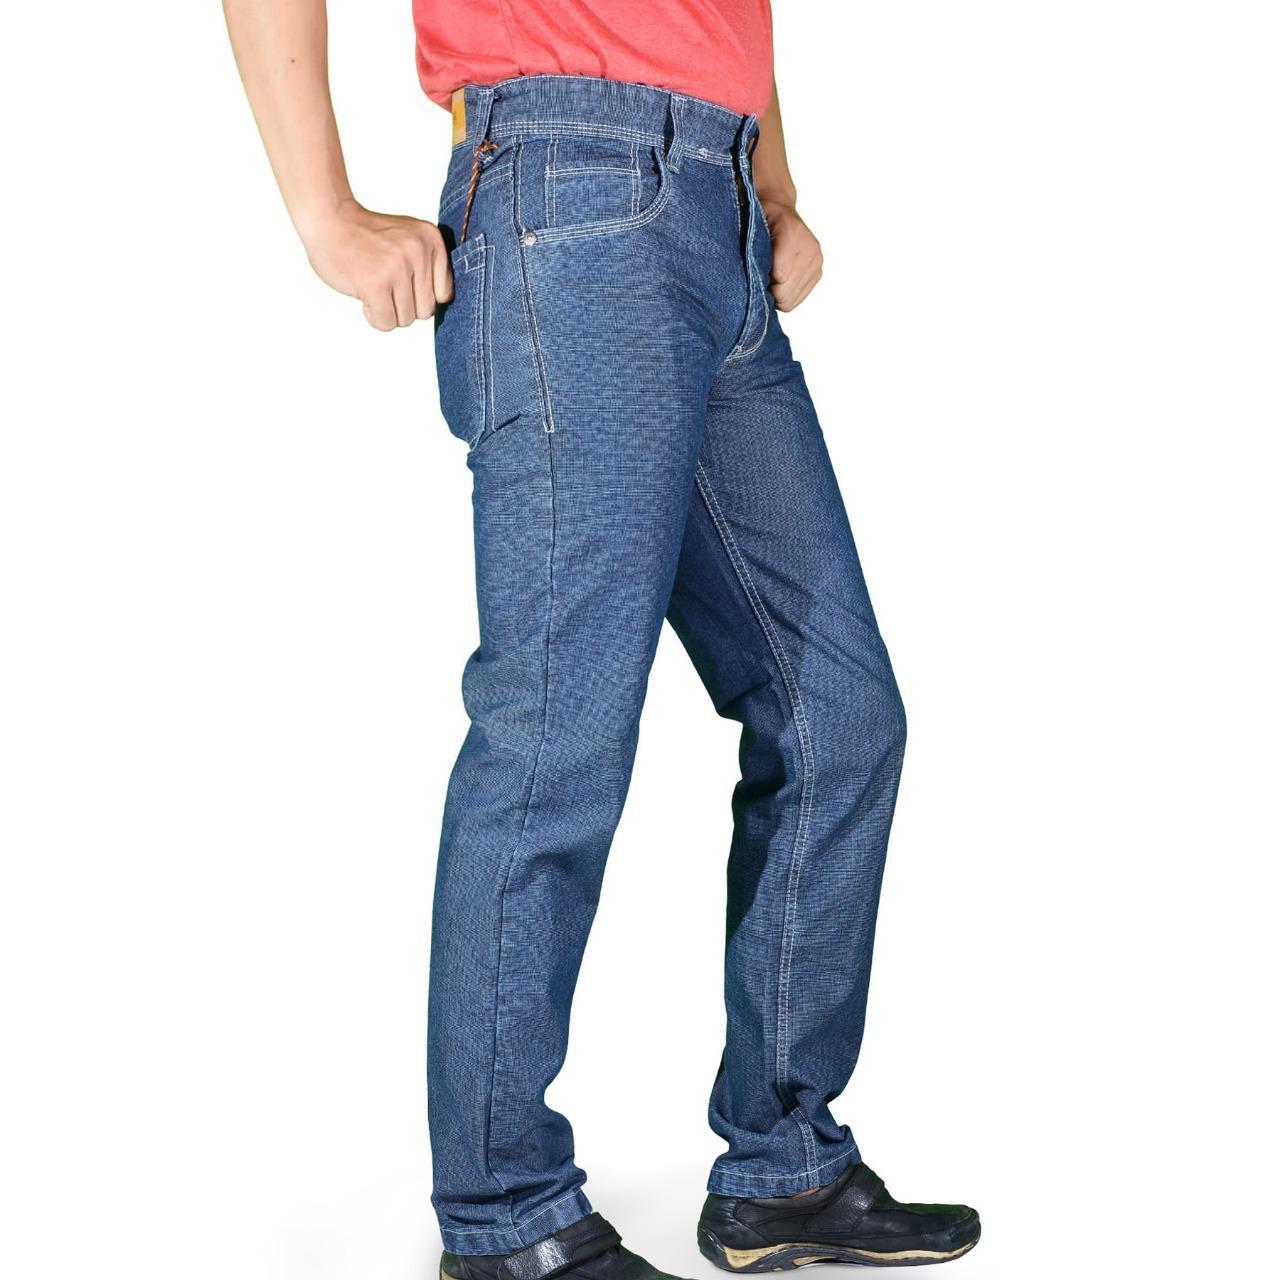 Emba Casual Celana Panjang Pria EPA 012 Modern Basic - Heavy Stone